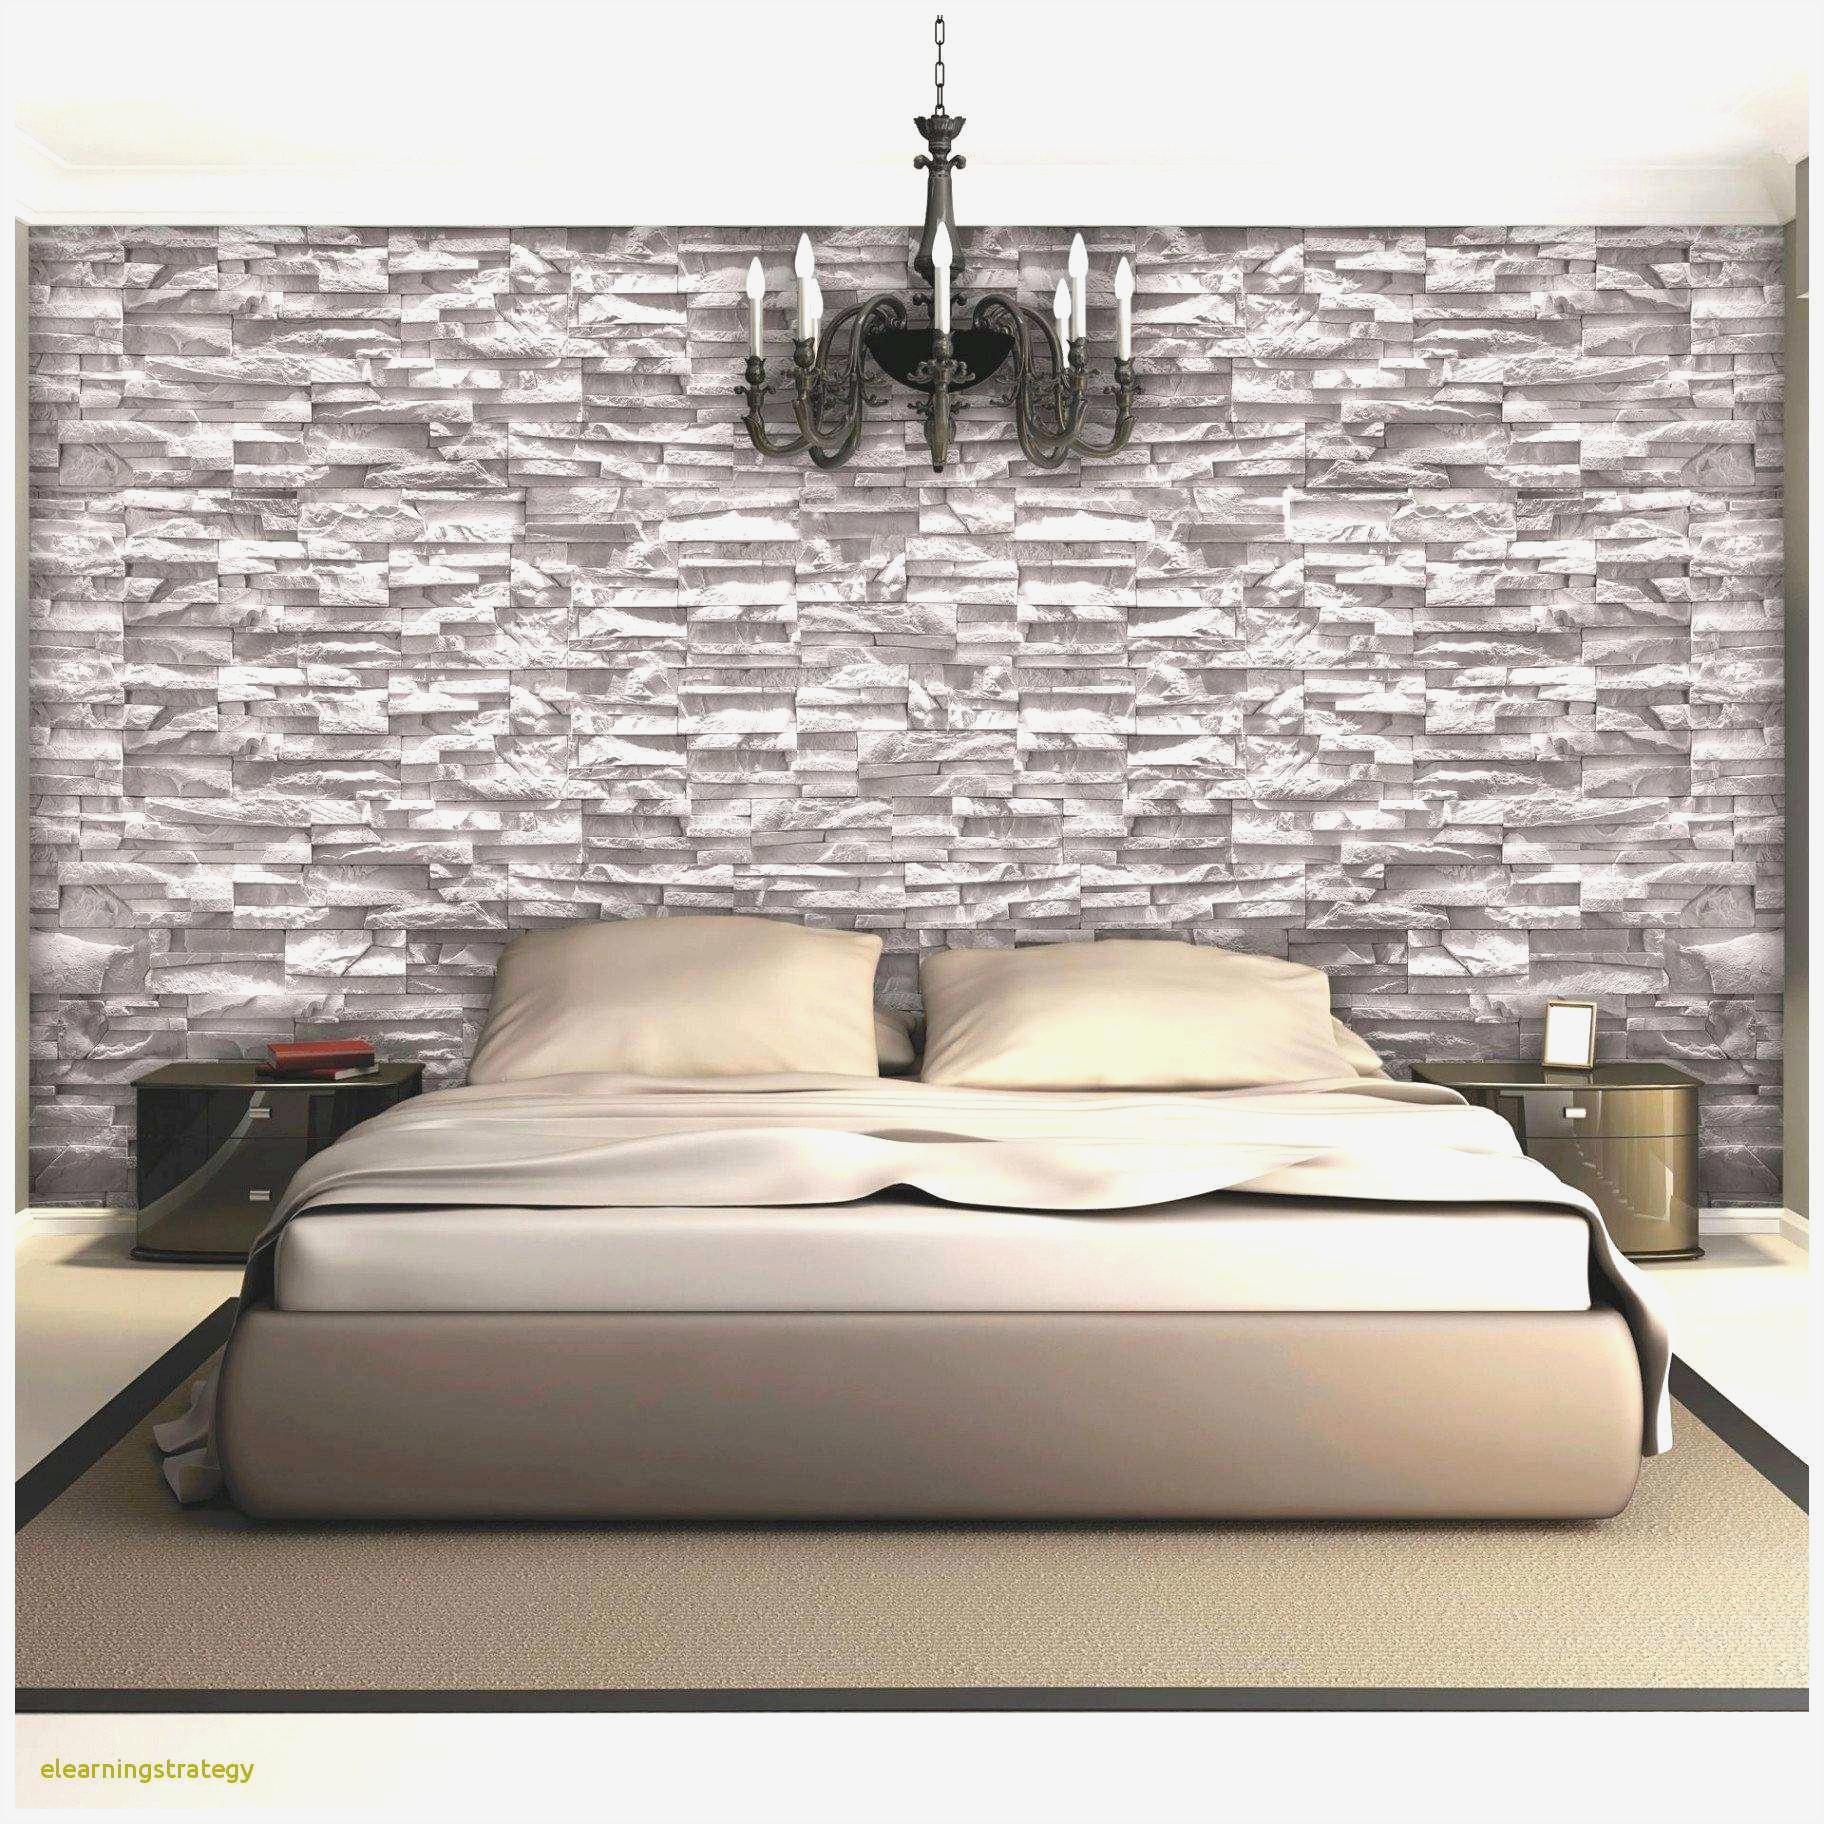 Full Size of Schlafzimmer Tapeten 2020 Modern Ideen Tapete Massivholz Betten Deckenleuchten Komplette Romantische Komplettes Komplett Günstig Gardinen Für Deko Wohnzimmer Schlafzimmer Tapeten 2020